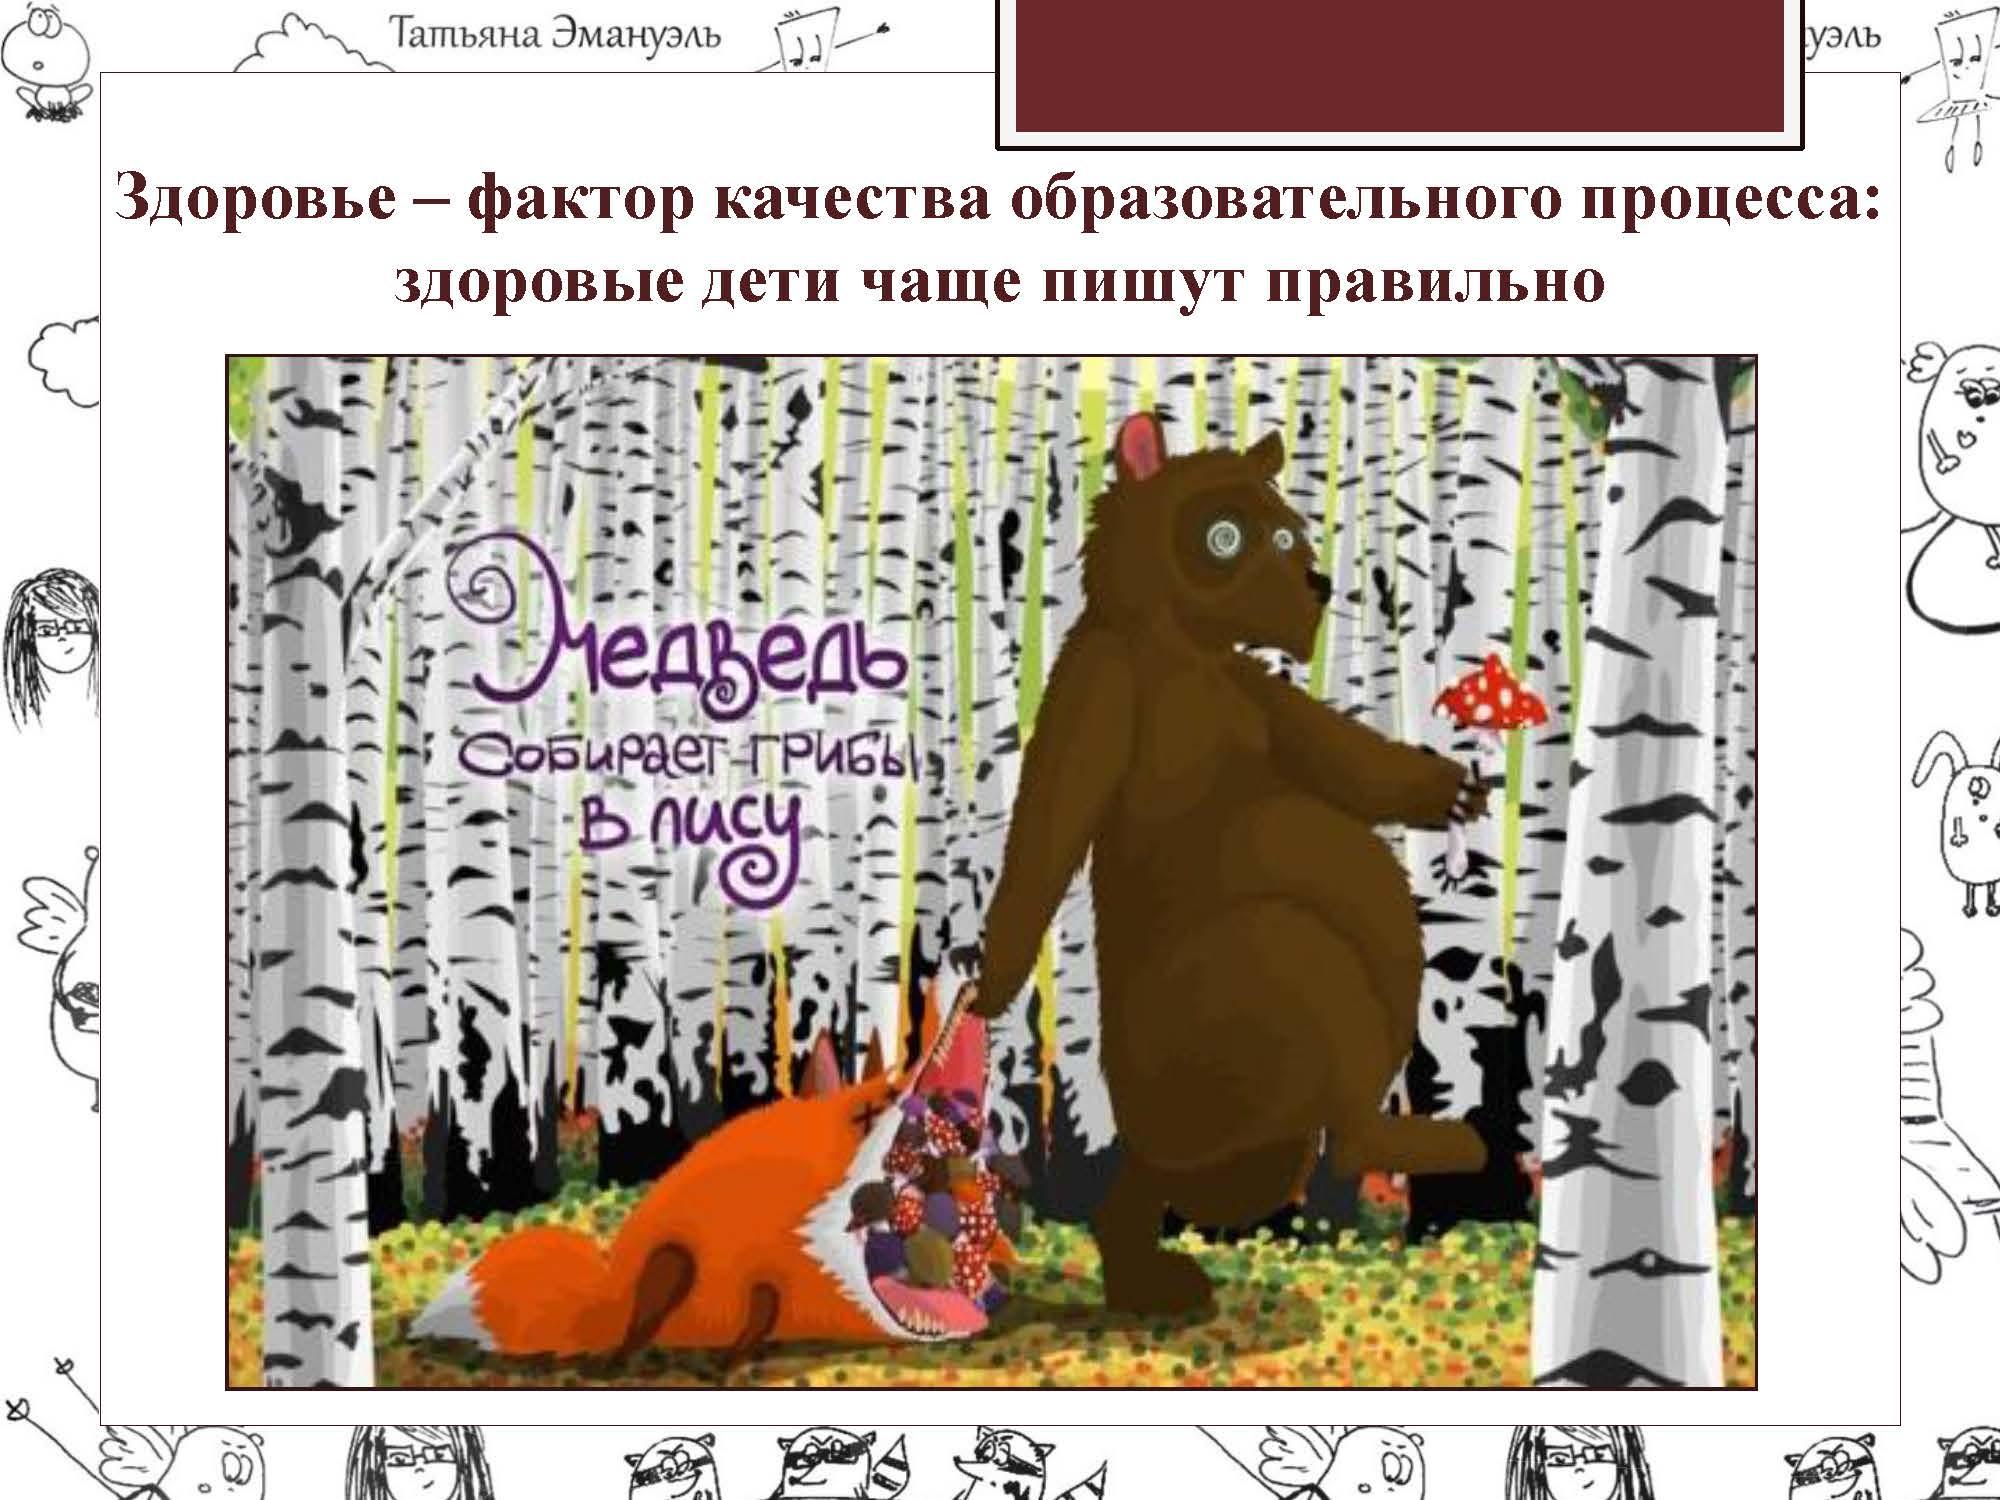 06 февраля эмануэль_Страница_117